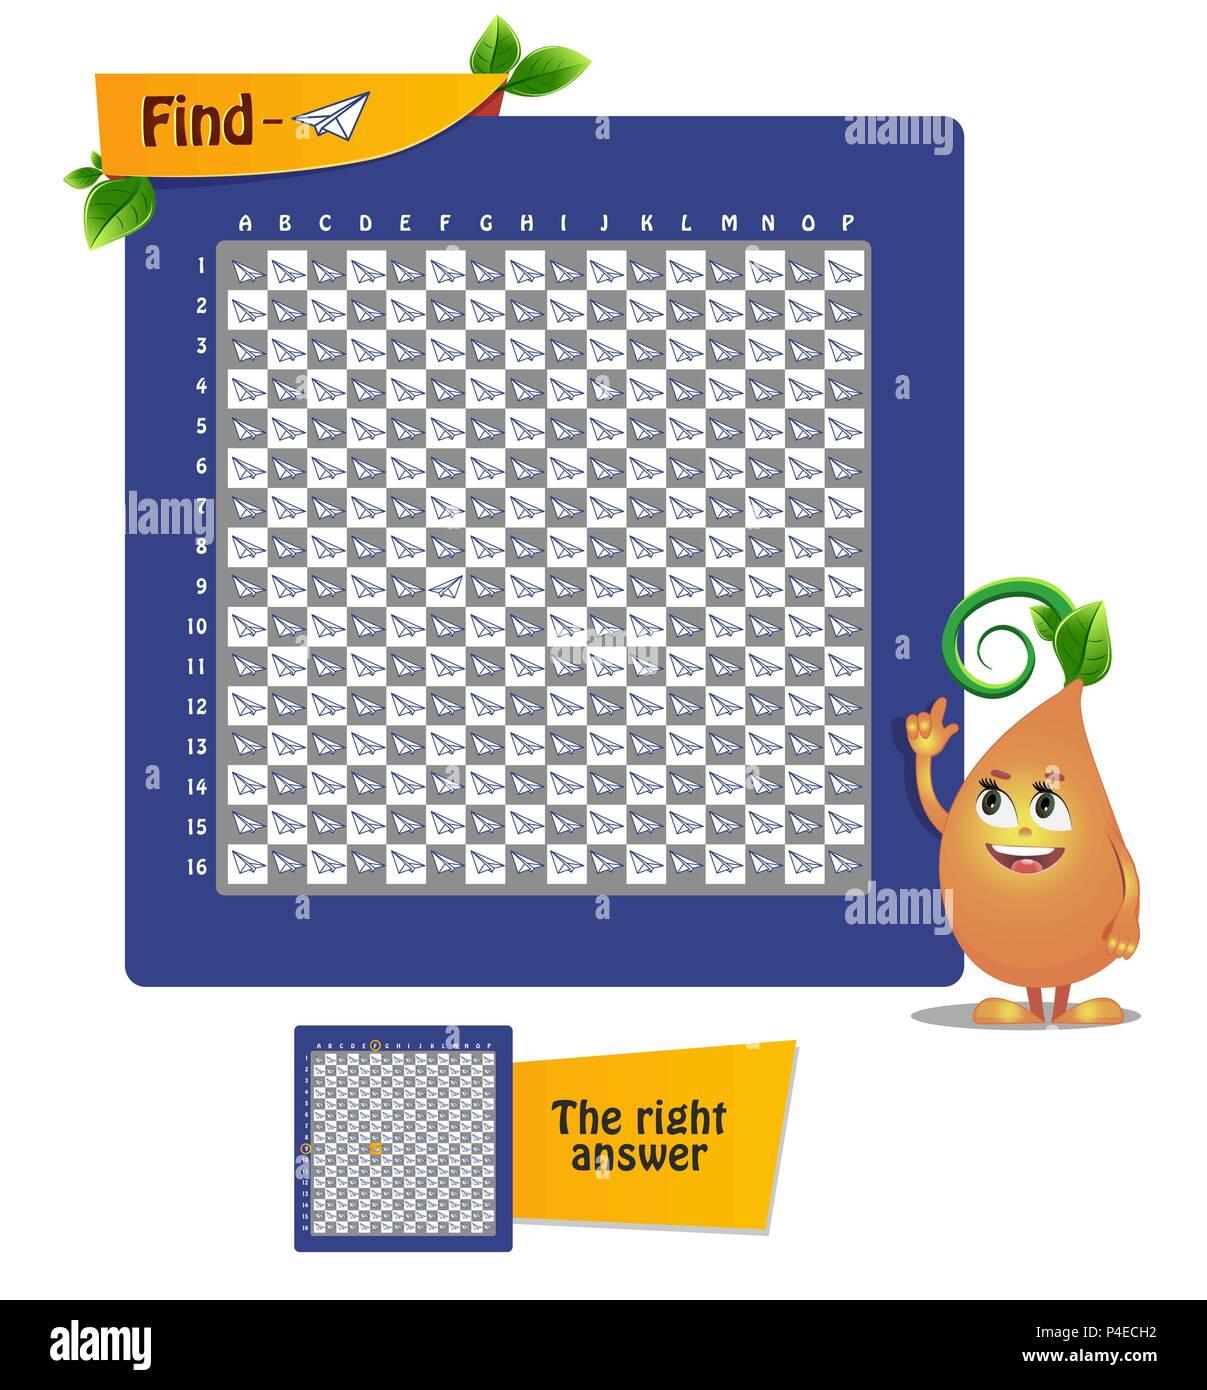 Child Iq Test Stock Photos & Child Iq Test Stock Images - Alamy